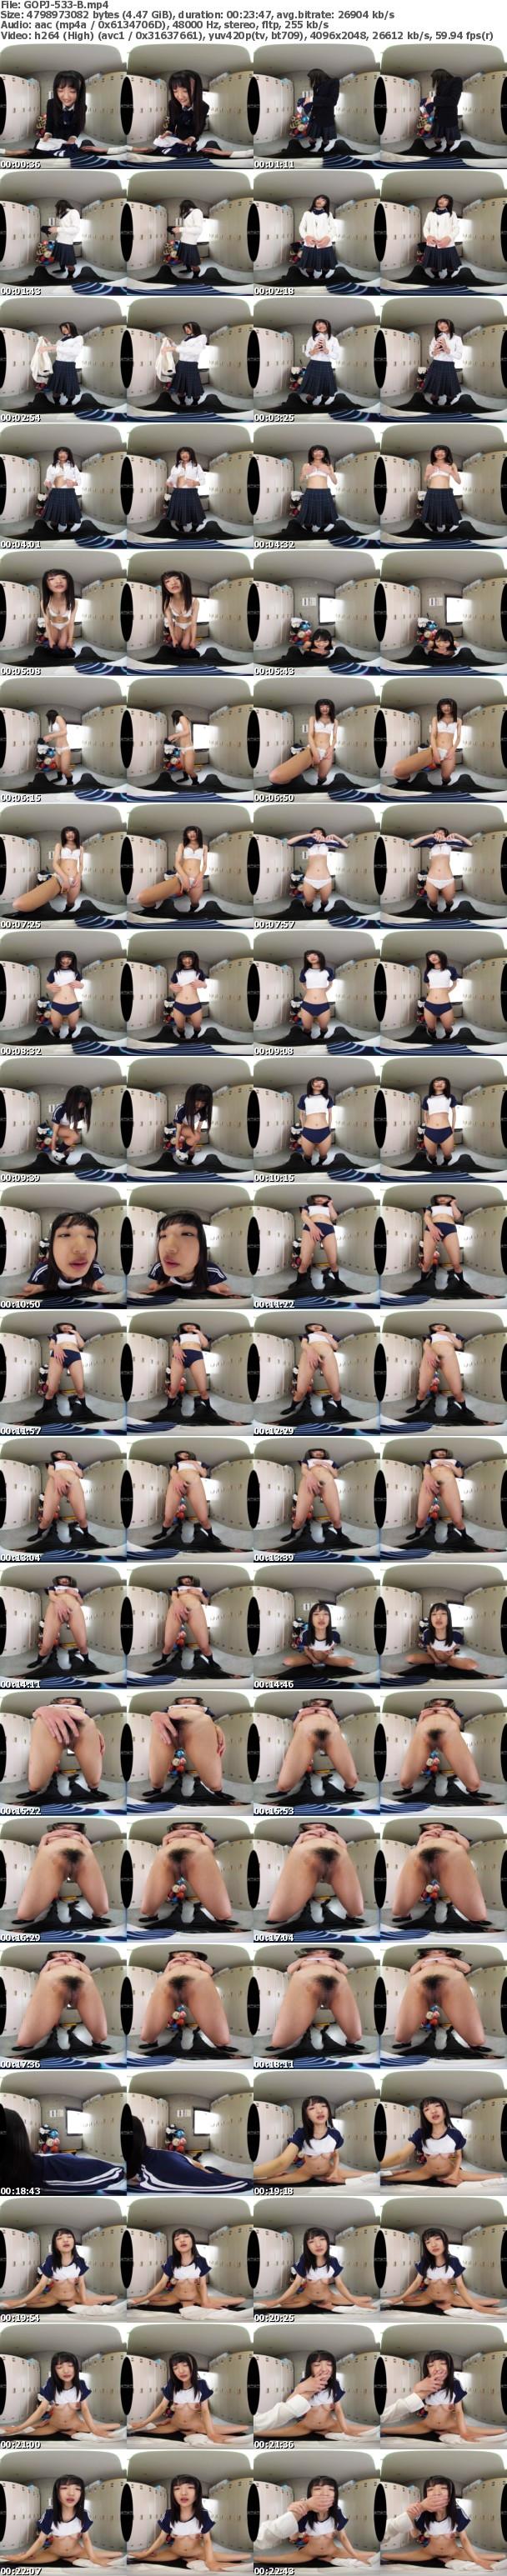 (VR) GOPJ-533 HQ 劇的超高画質 スリル満点!声我慢!清楚系彼女と発情暴走!教室・図書室・体育倉庫でイチャラブ三昧!